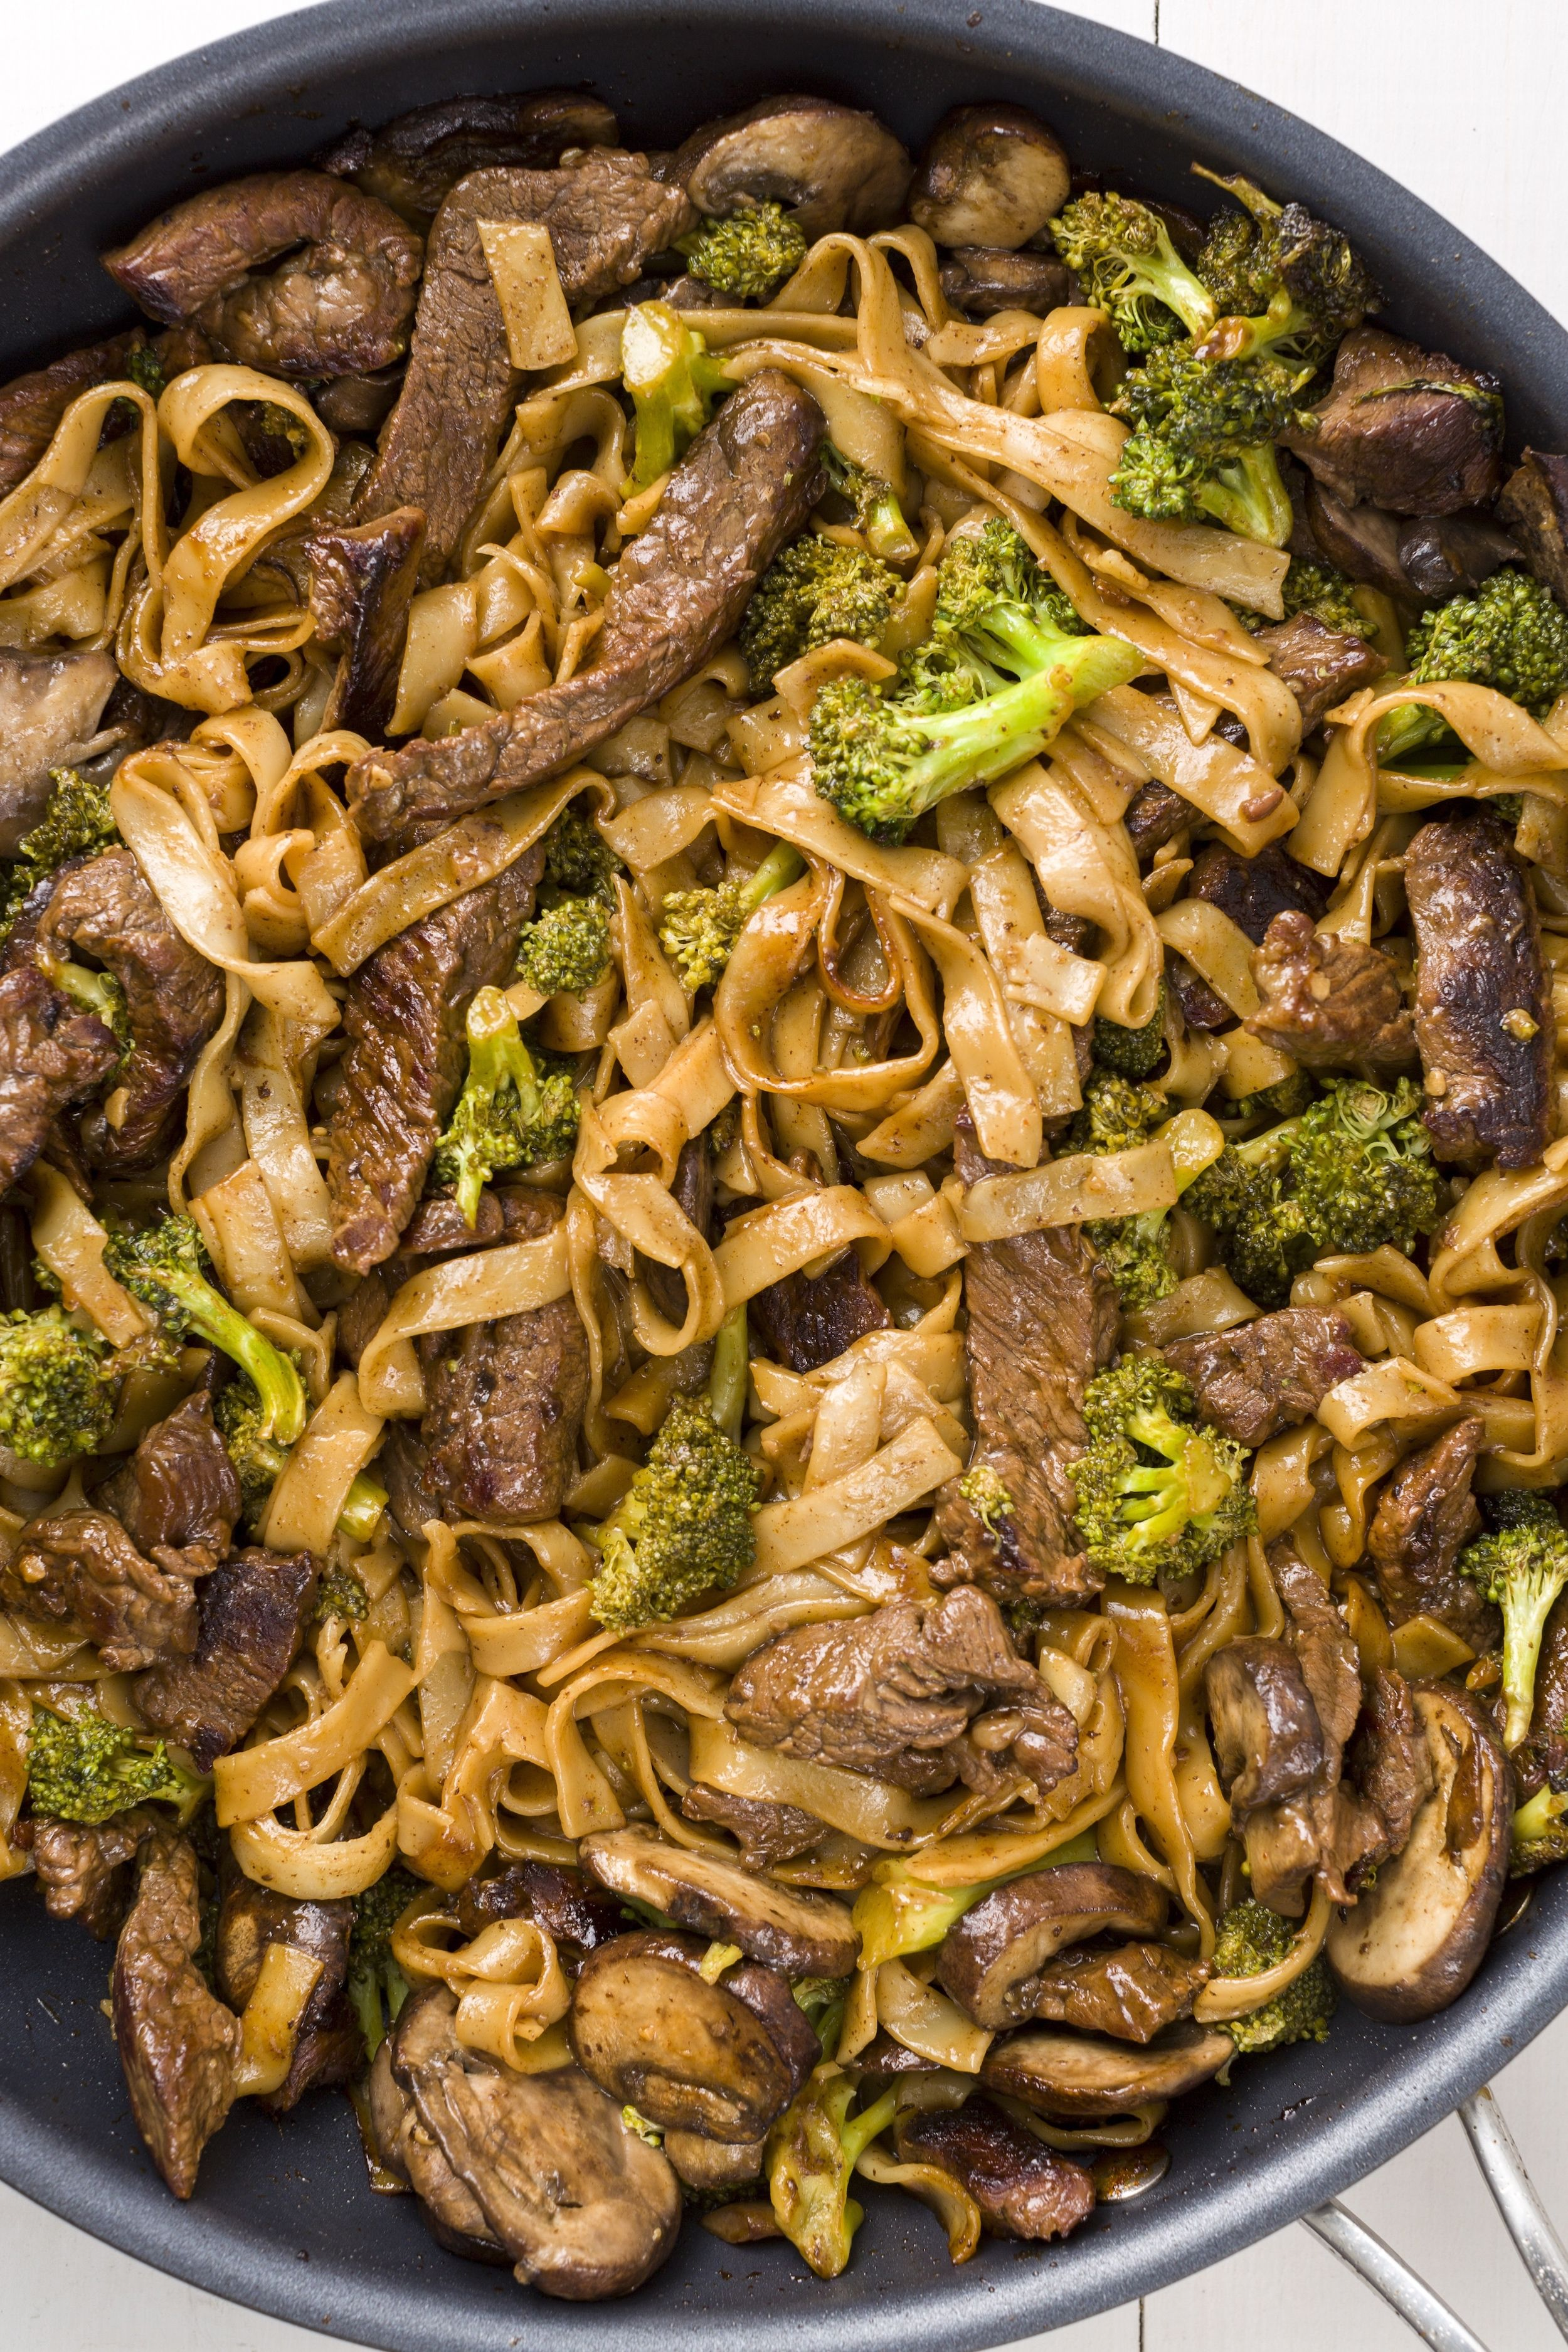 25 Bomba** Ways To Eat Asian Noodles